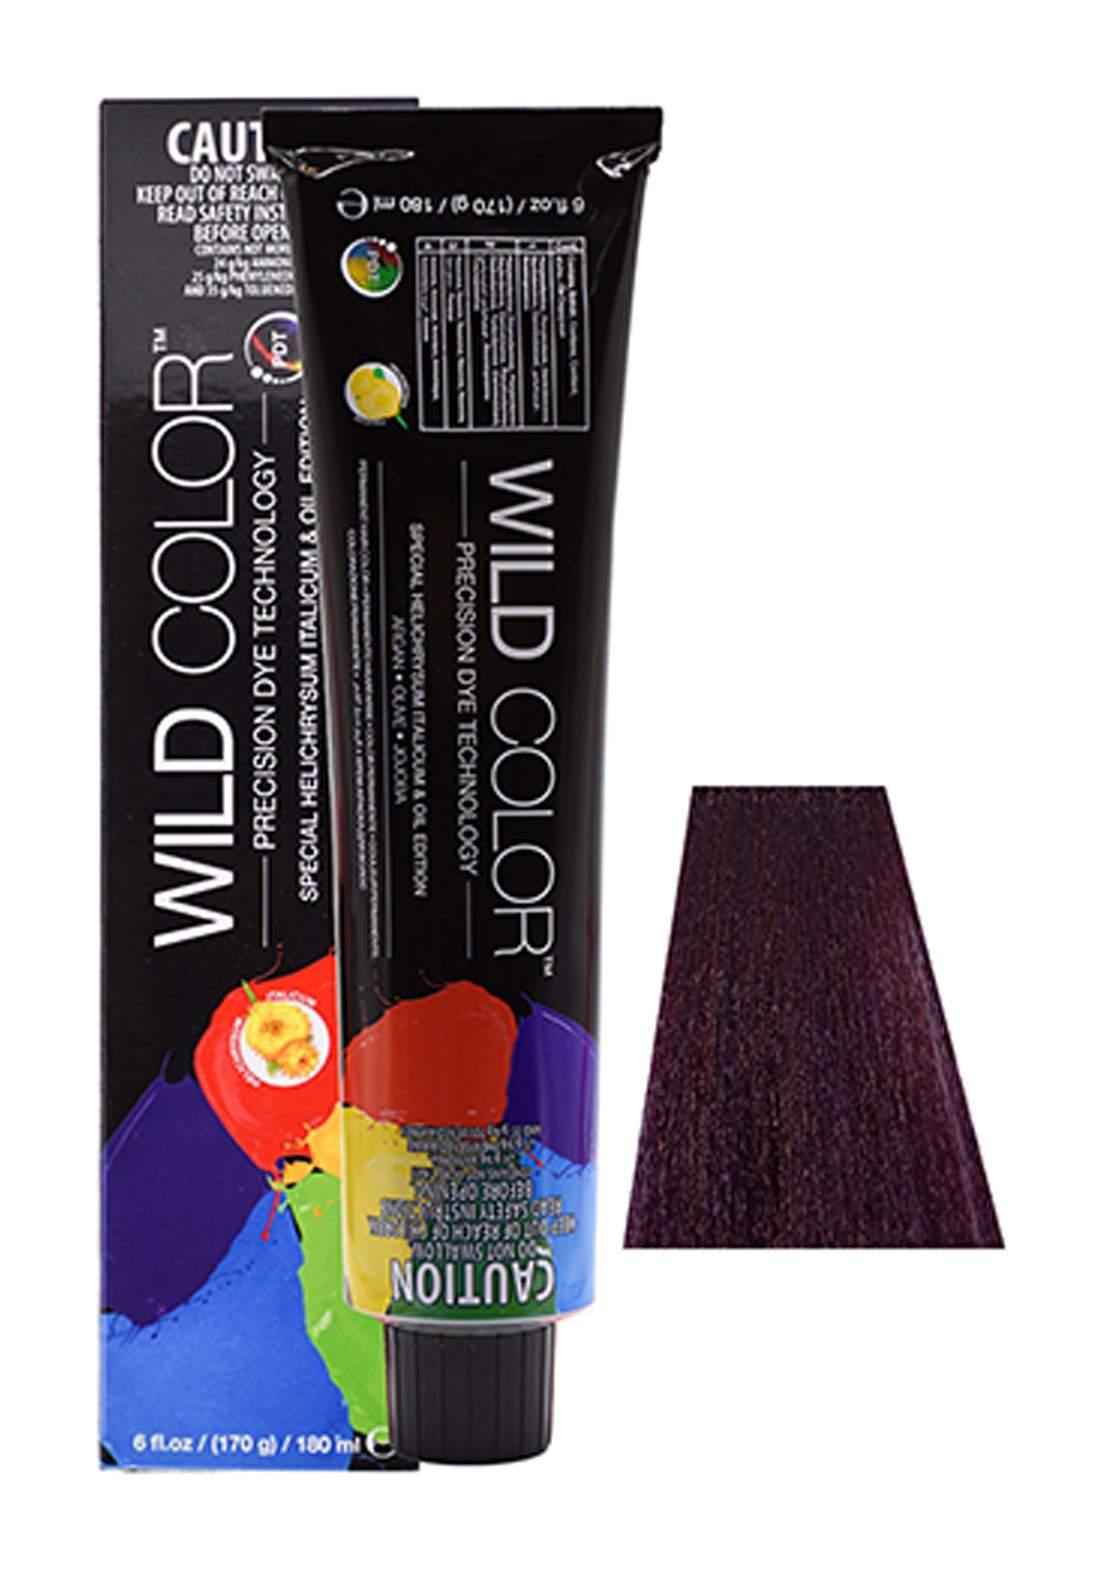 Wild Color Hair Color Cream 5.2  5V - Light  Violete  Brown صبغة شعر